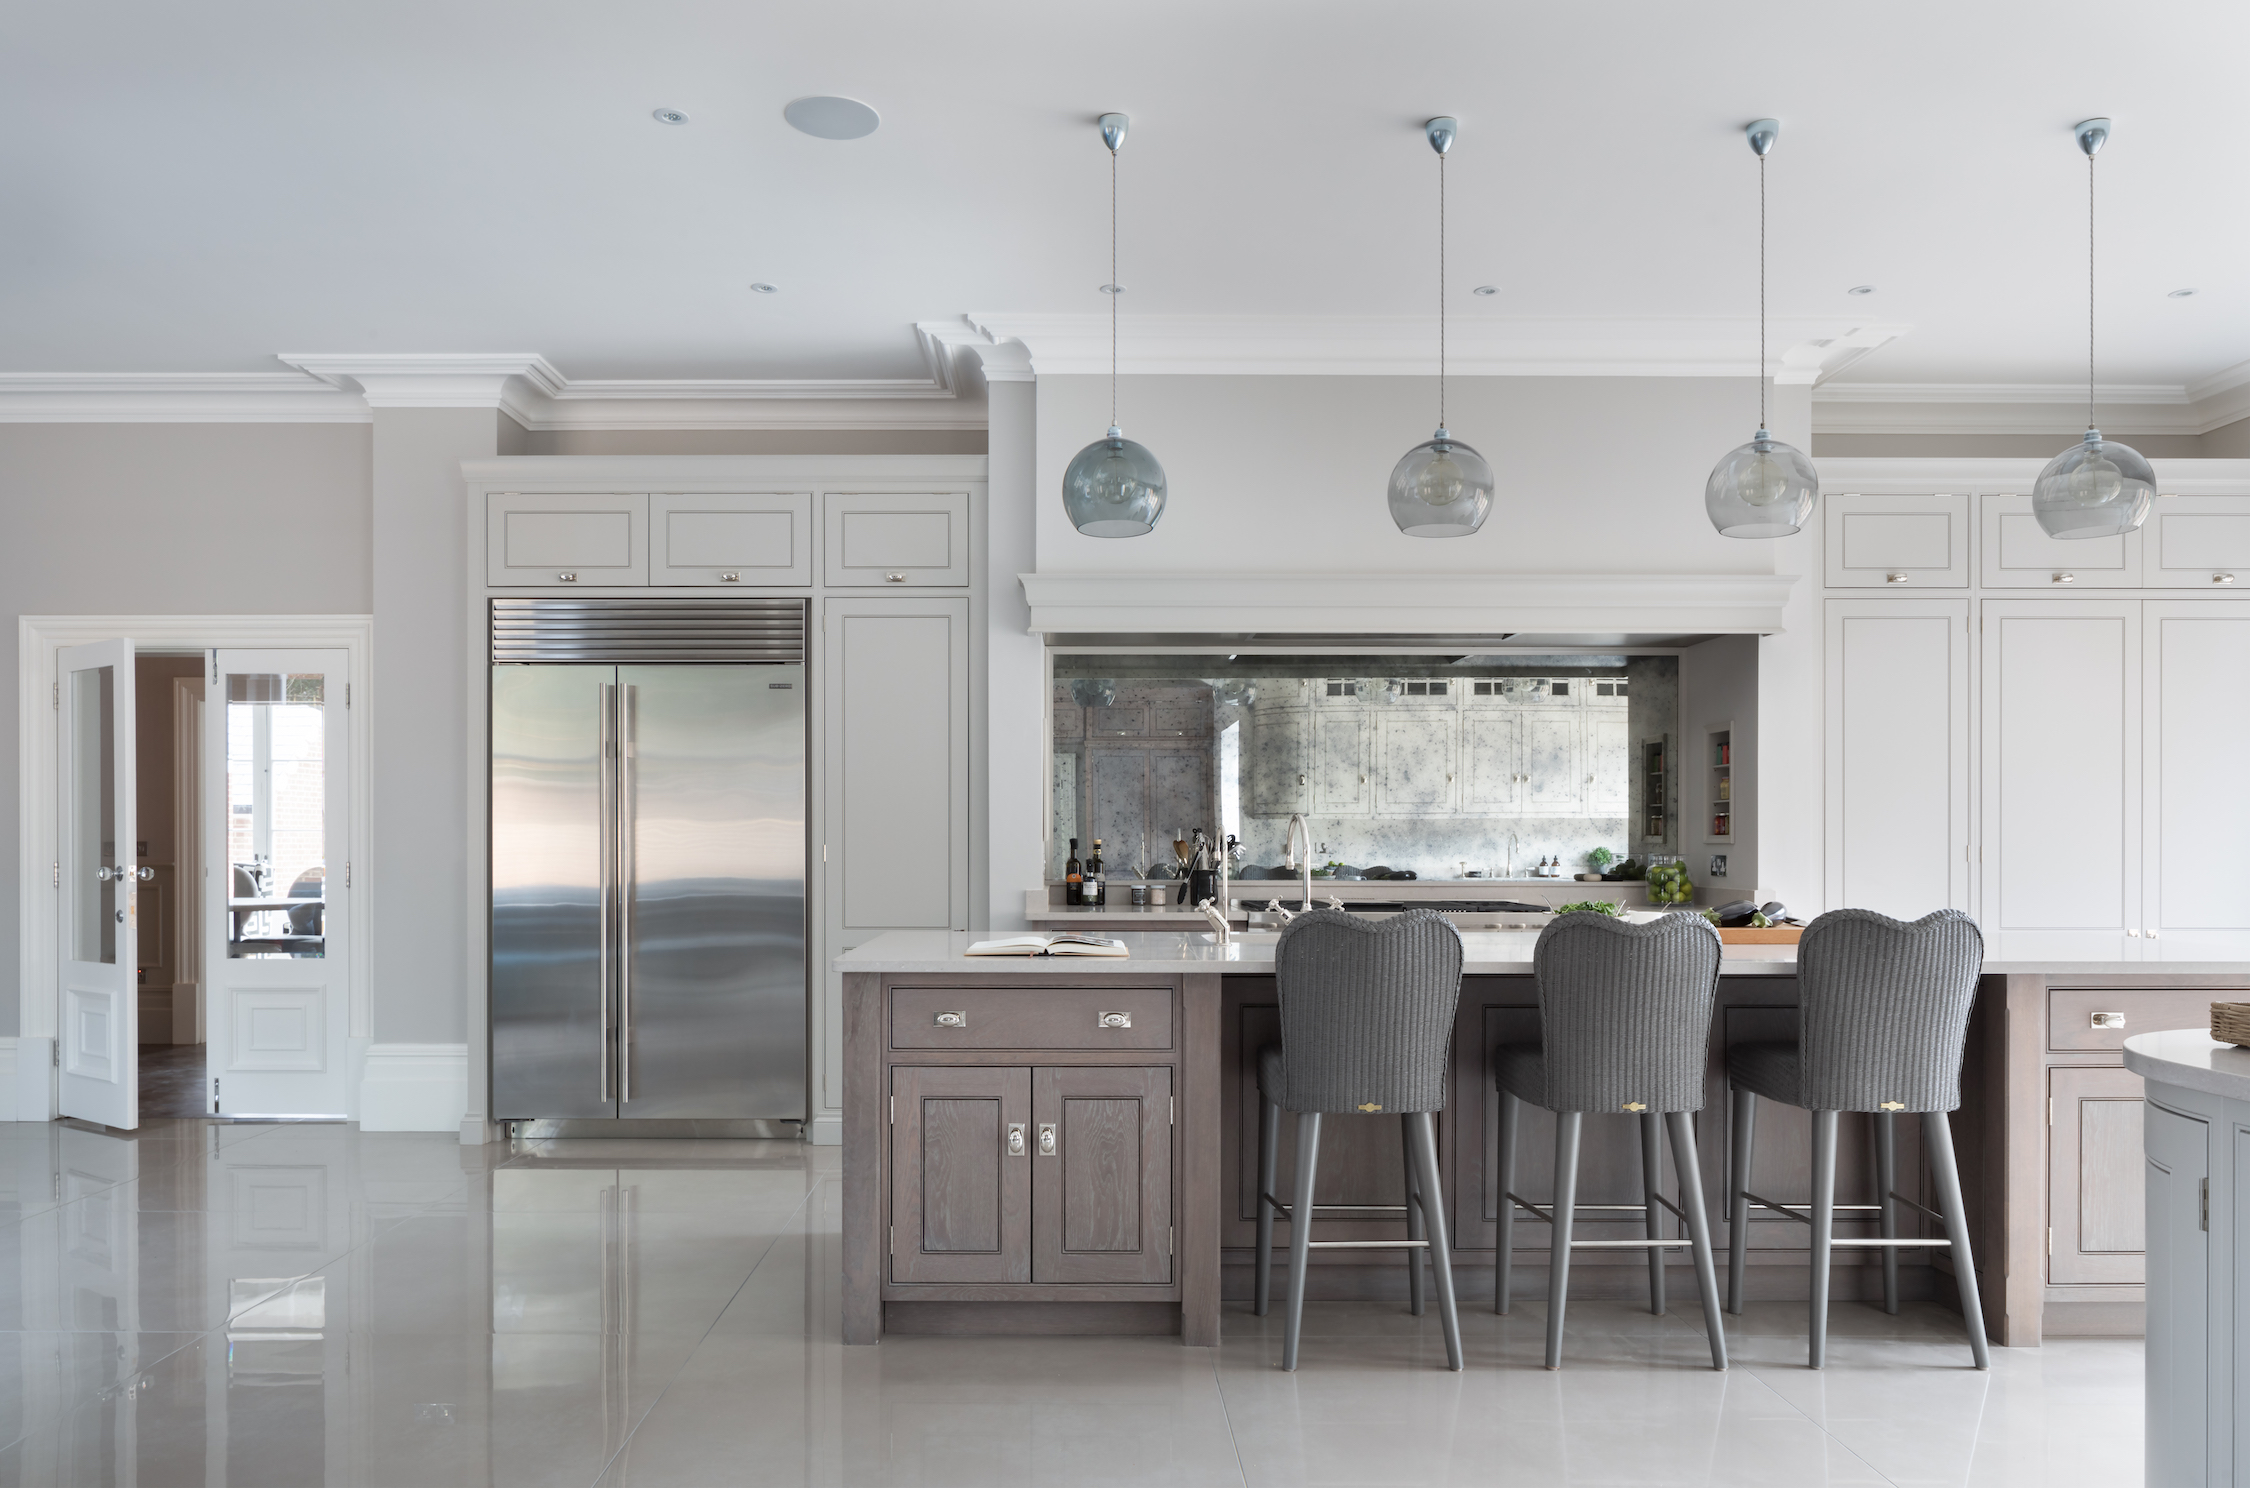 Epping Forest Project - Luxury Bespoke Kitchen - Humphrey Munson 19